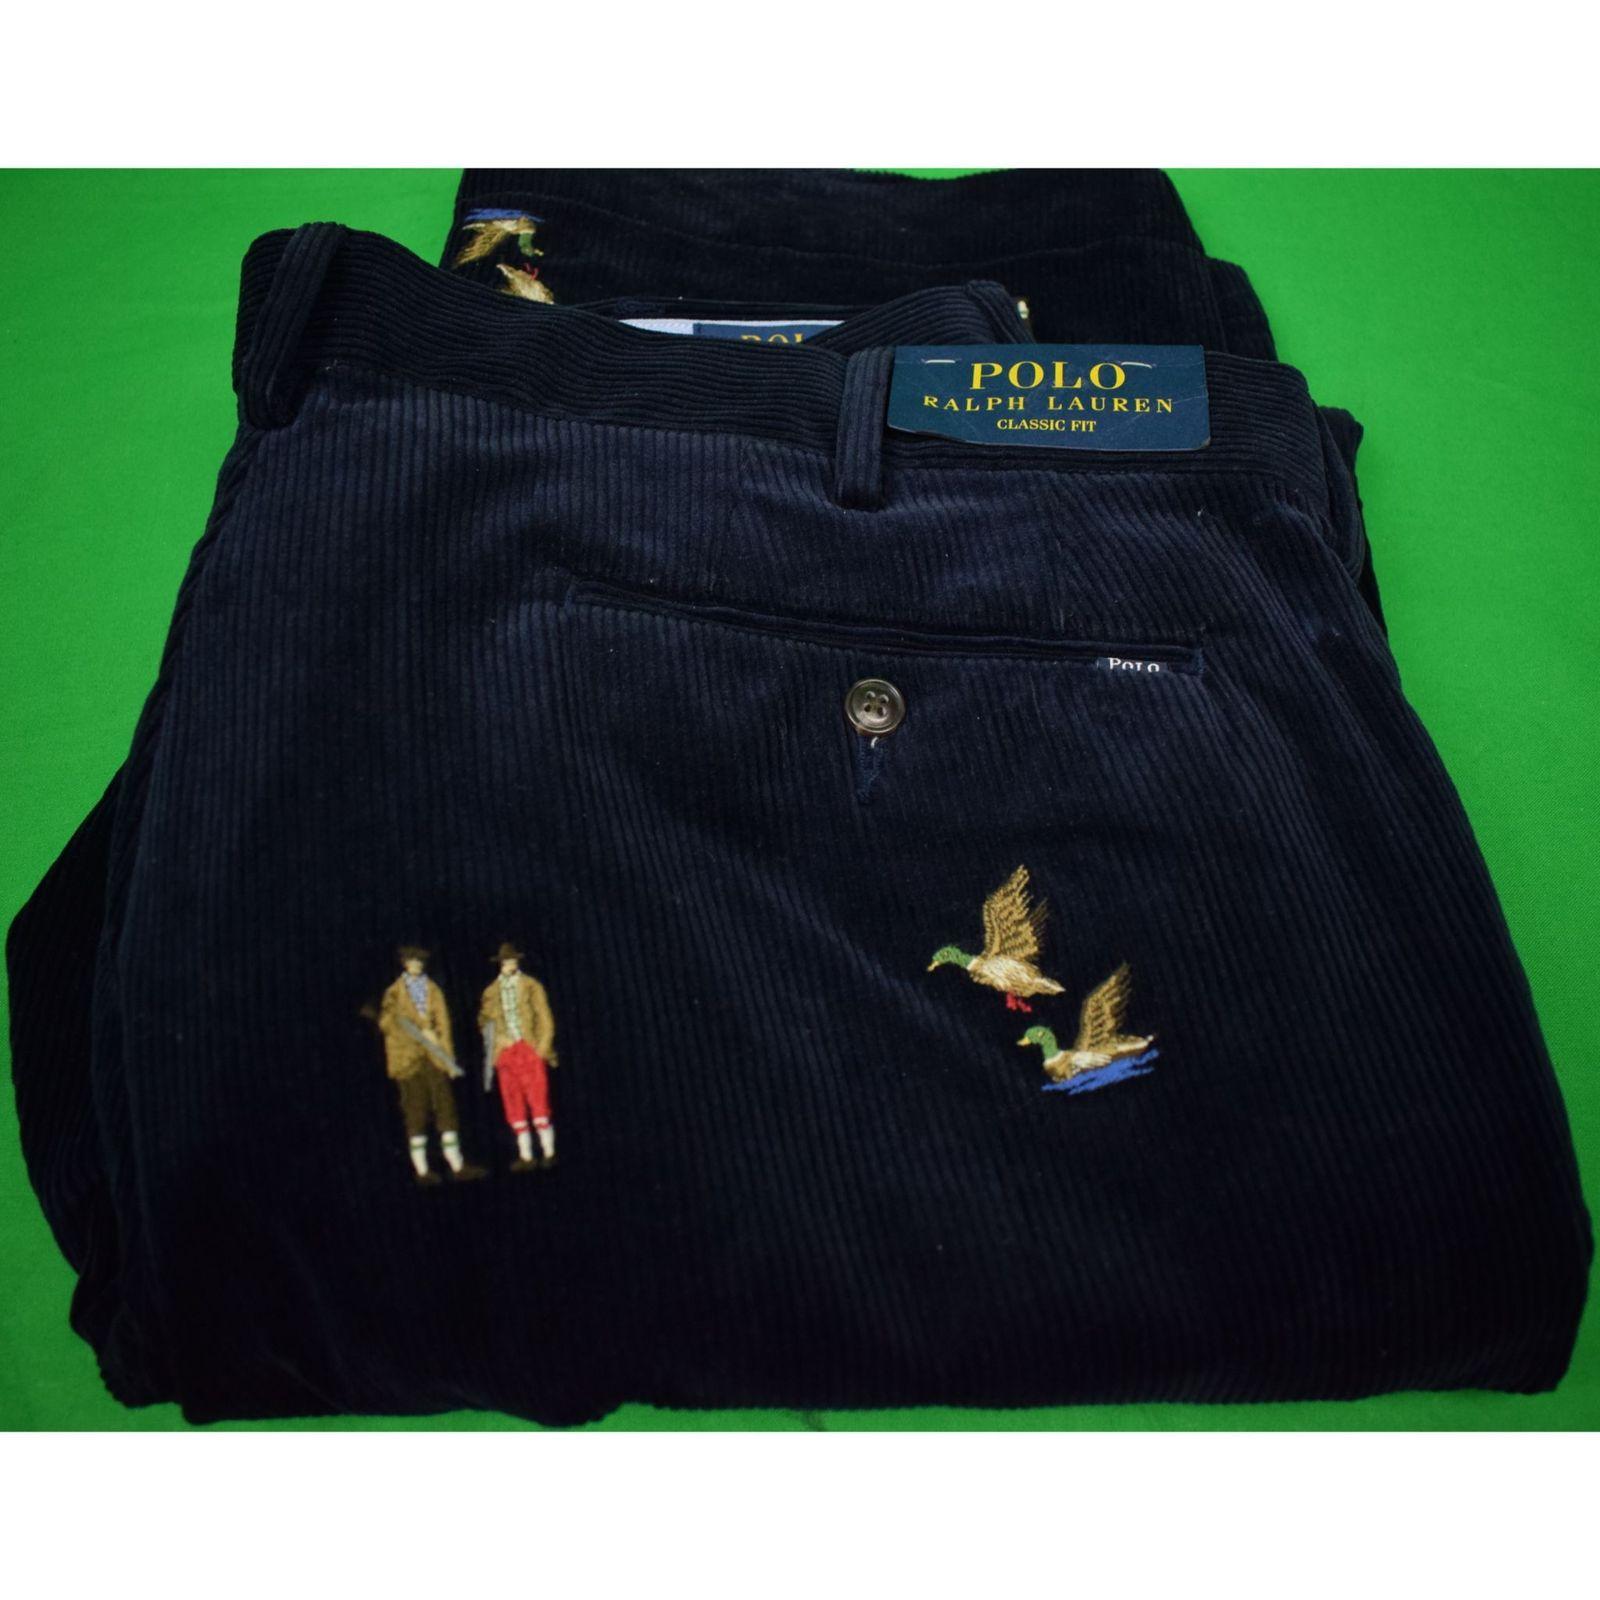 Polo Ralph Lauren Navy Corduroy w/ Embroidered Huntsmen/ Ducks & X'd Guns Classi - $250.00